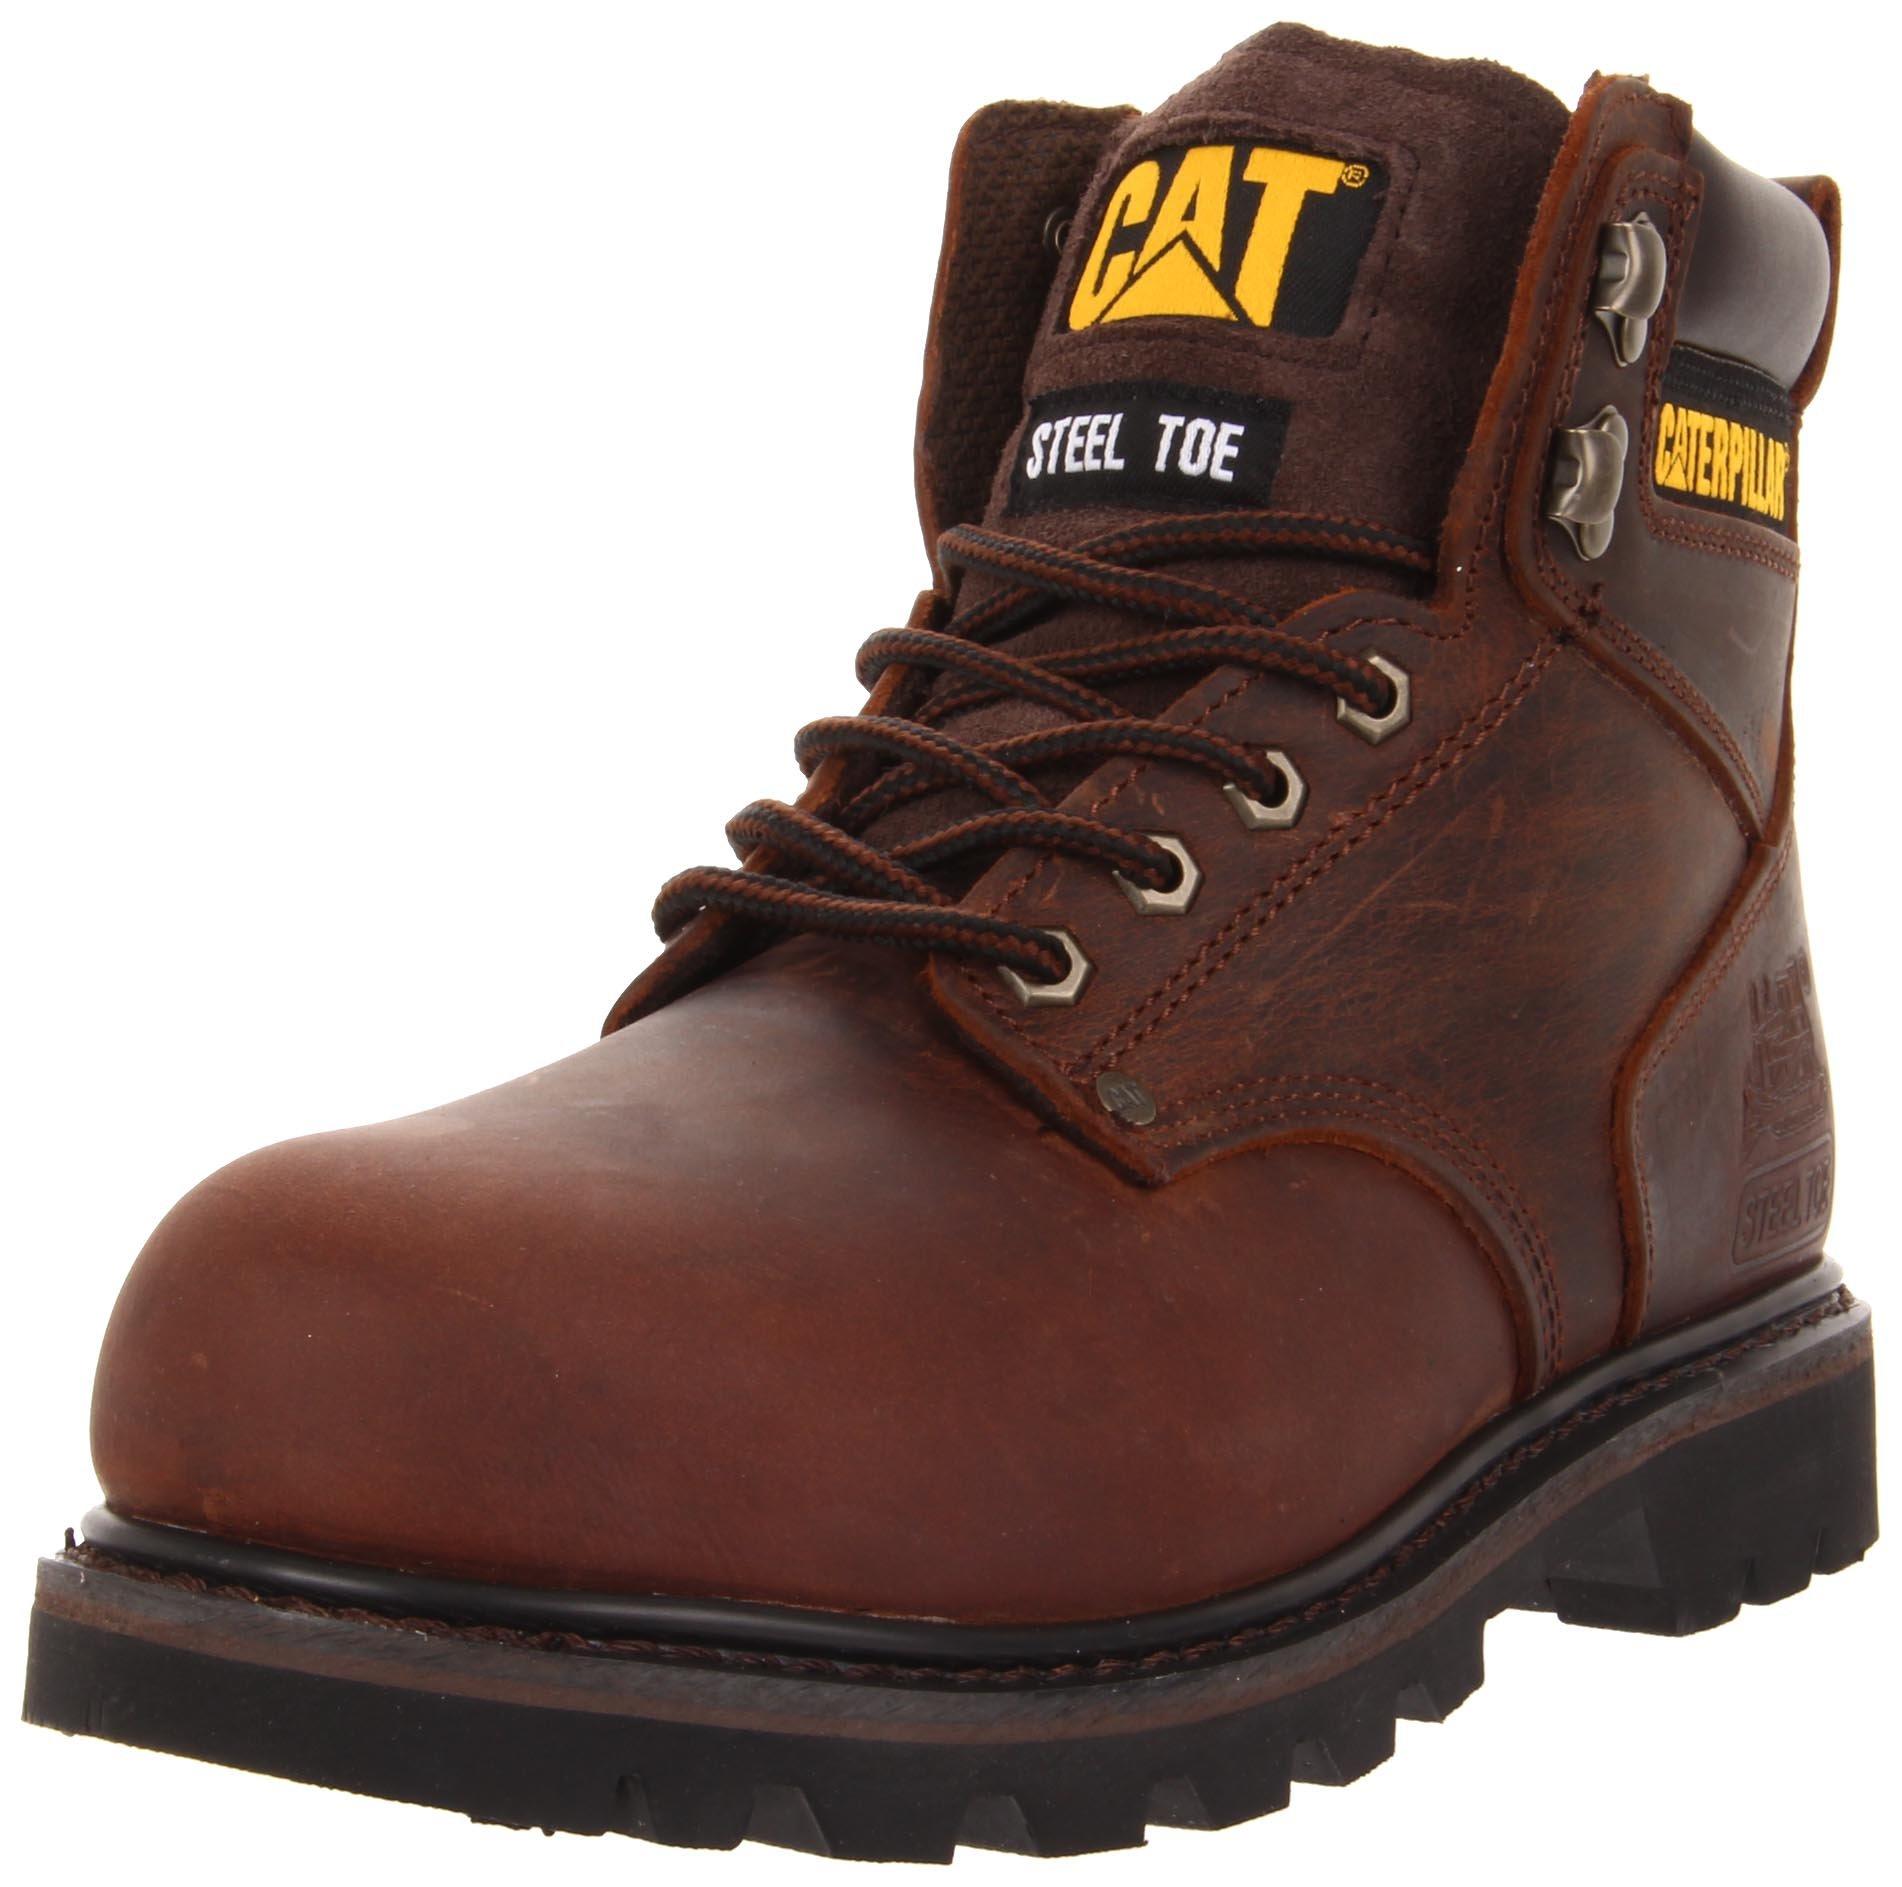 Caterpillar Men's Second Shift Steel Toe Work Boot,Dark Brown,10.5 W US by Caterpillar